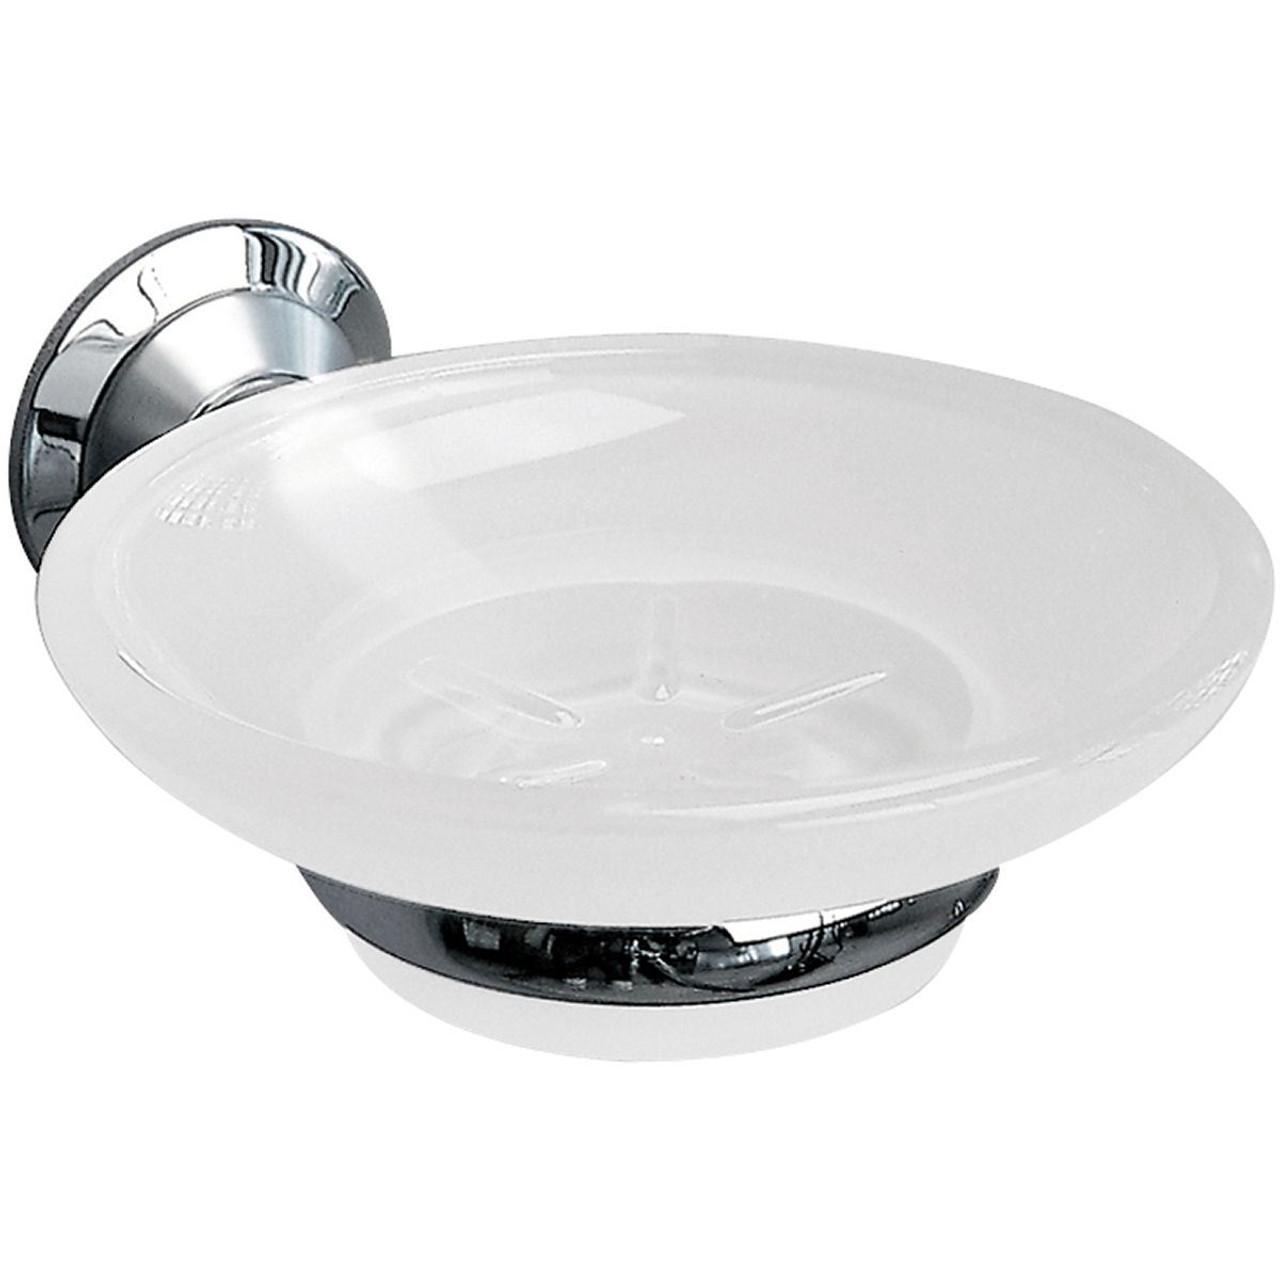 Miller Metro Soap Dish